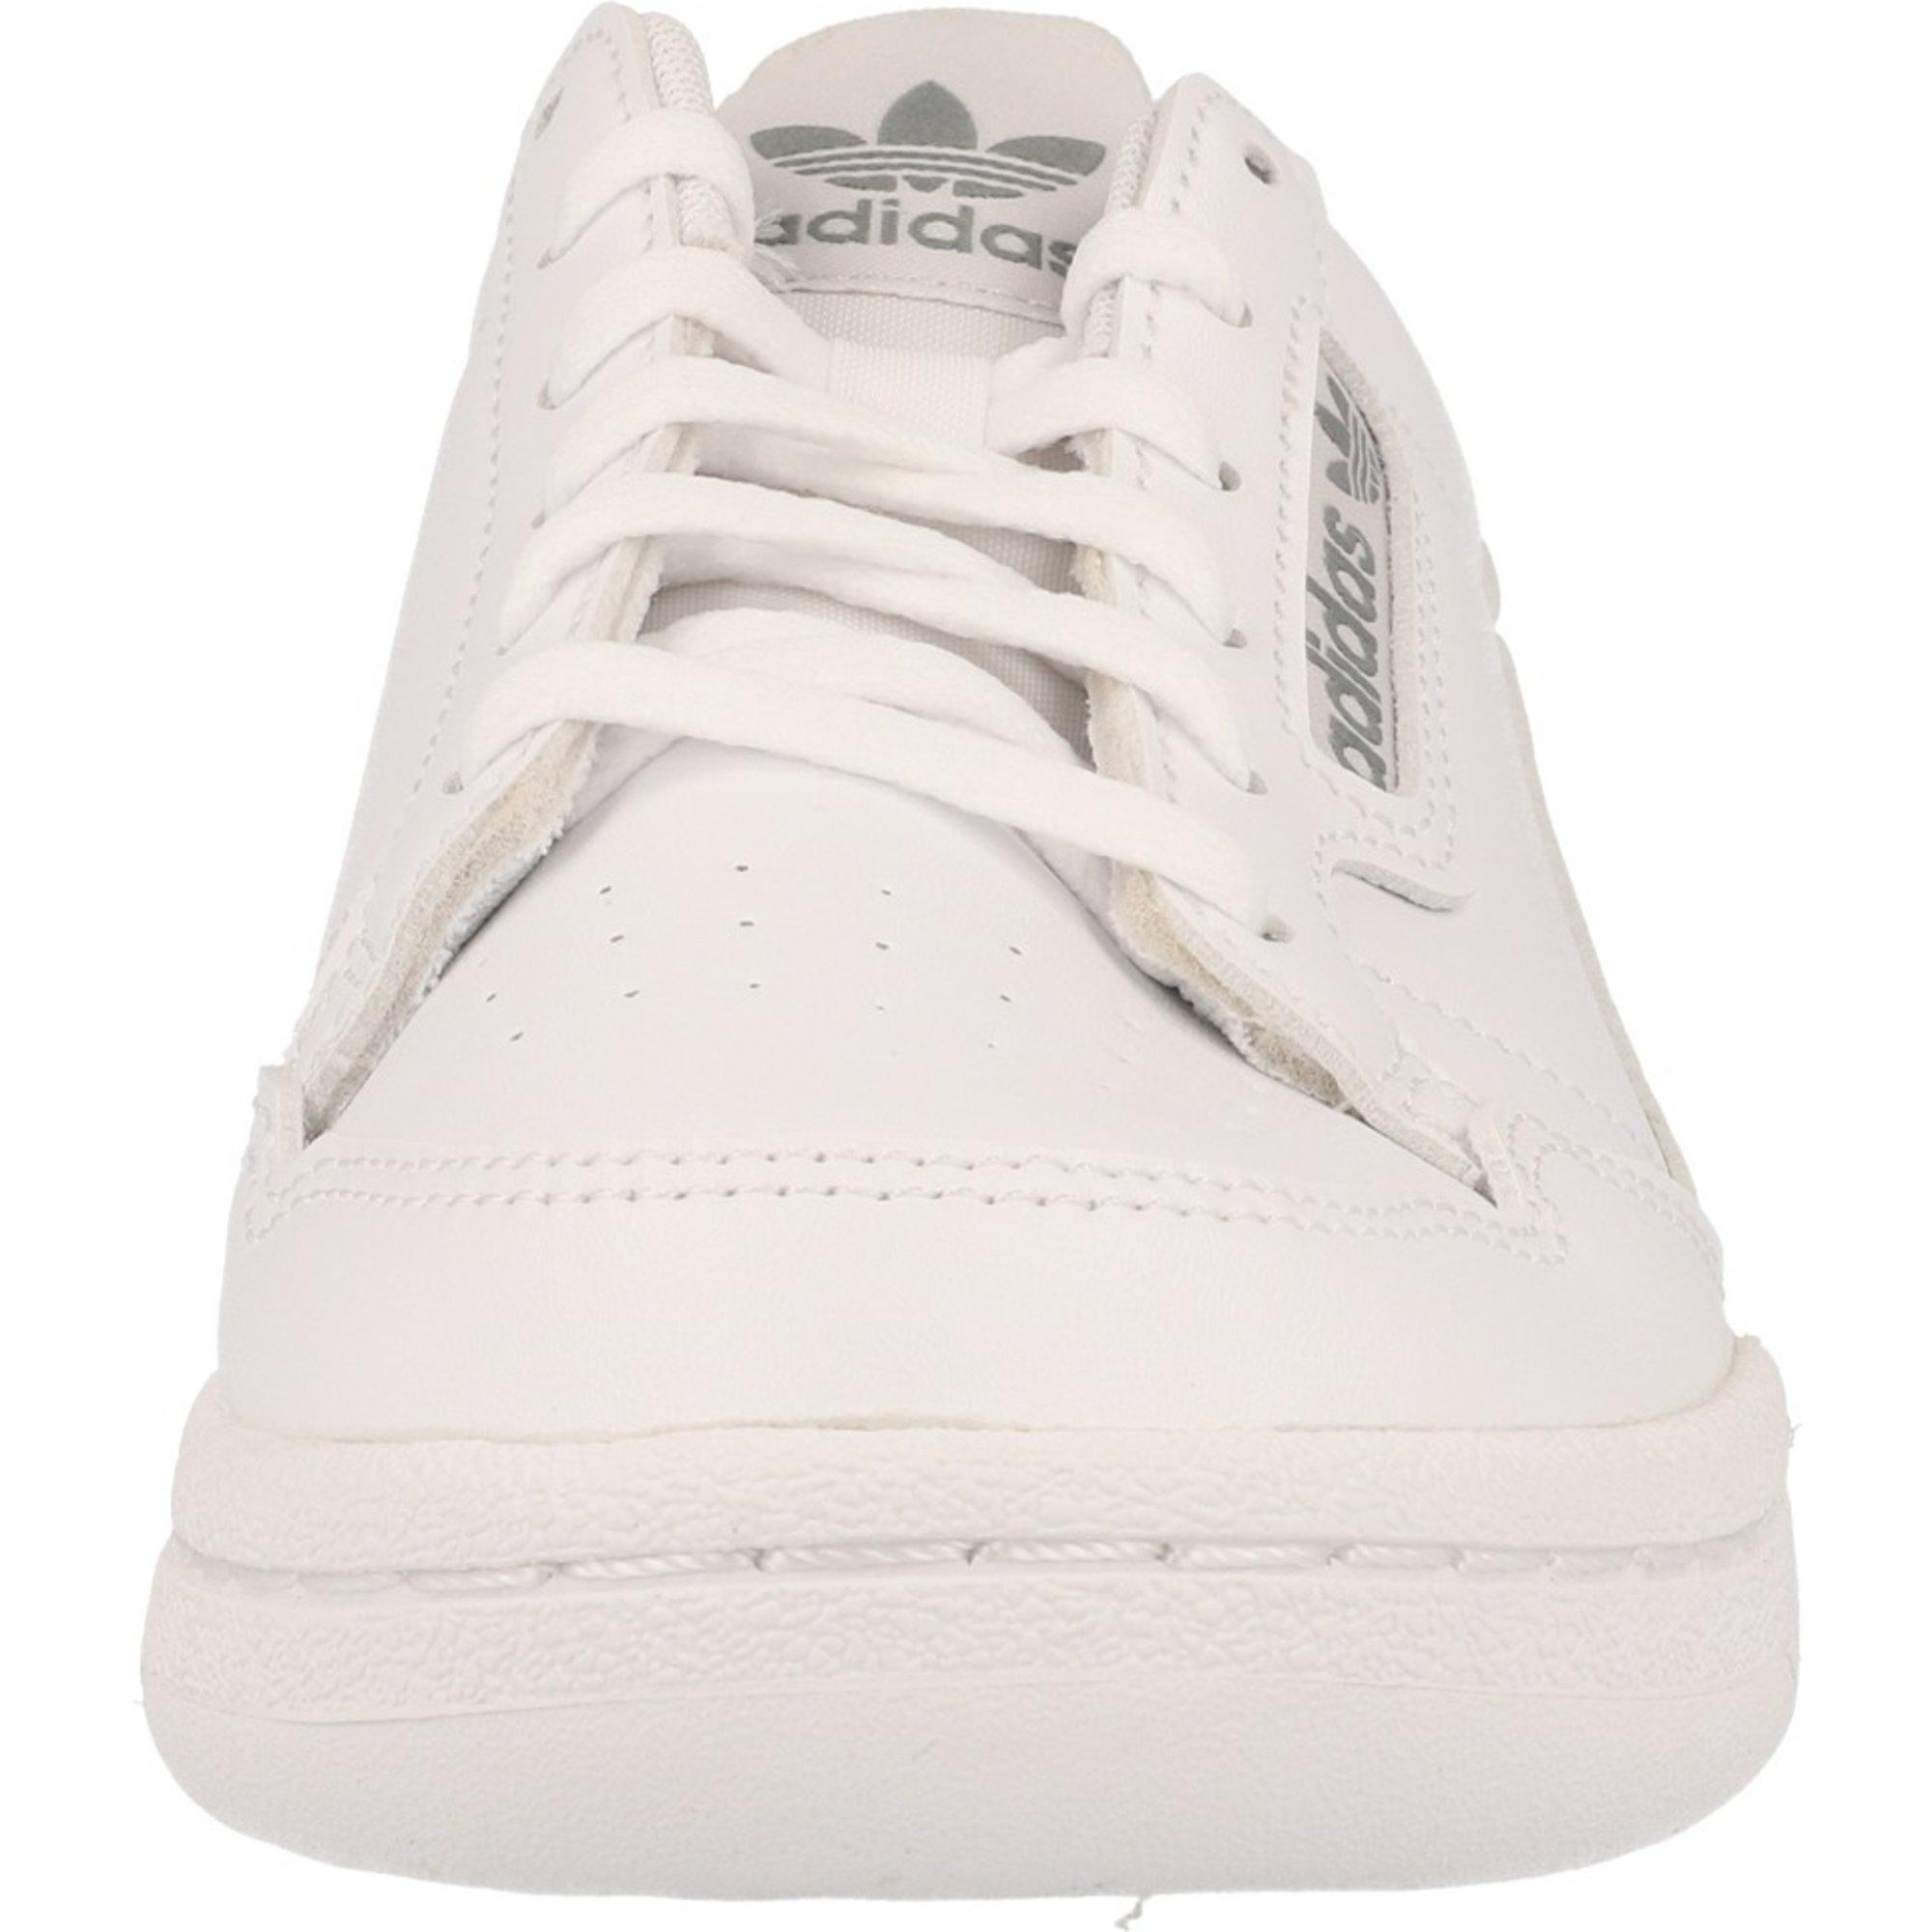 adidas Originals Continental 80 J WeißGraue Eins Synthetik Jugend